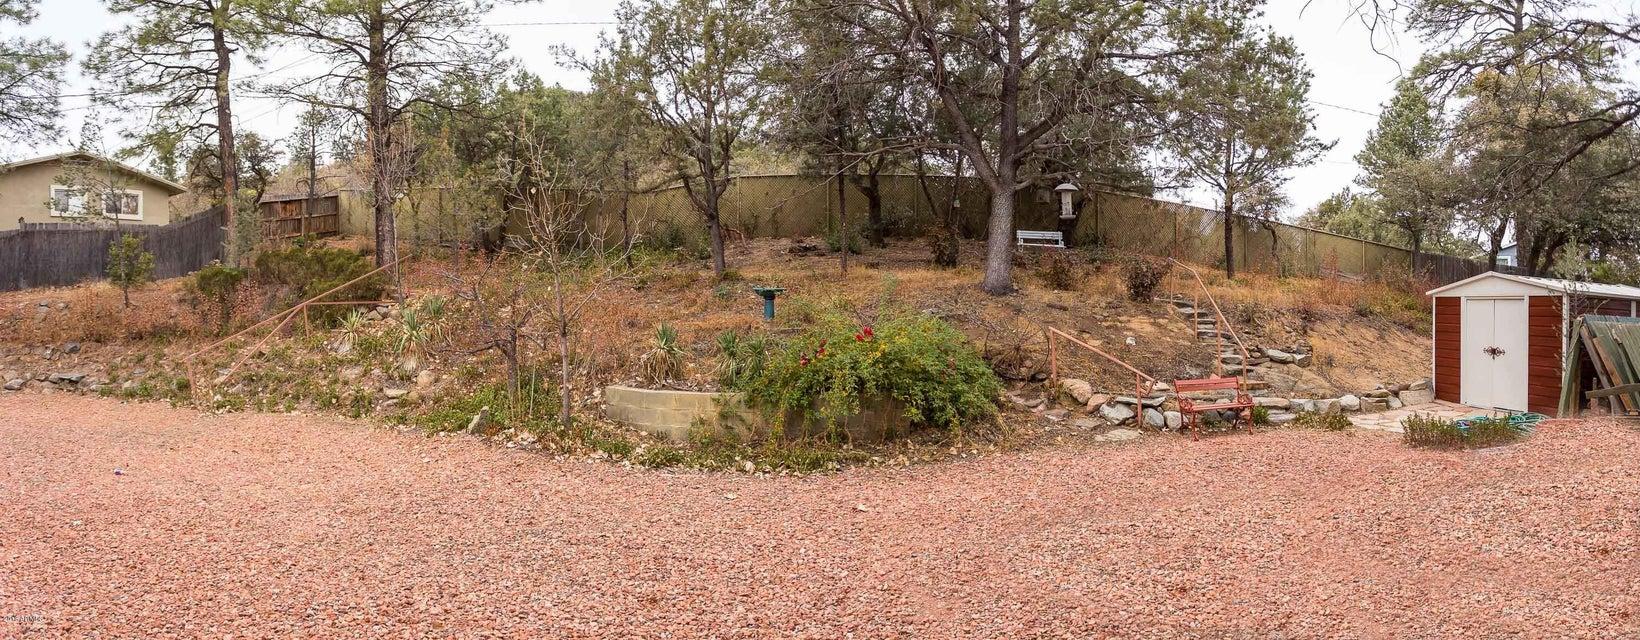 1211 COUNTRY CLUB Drive Prescott, AZ 86303 - MLS #: 5722496